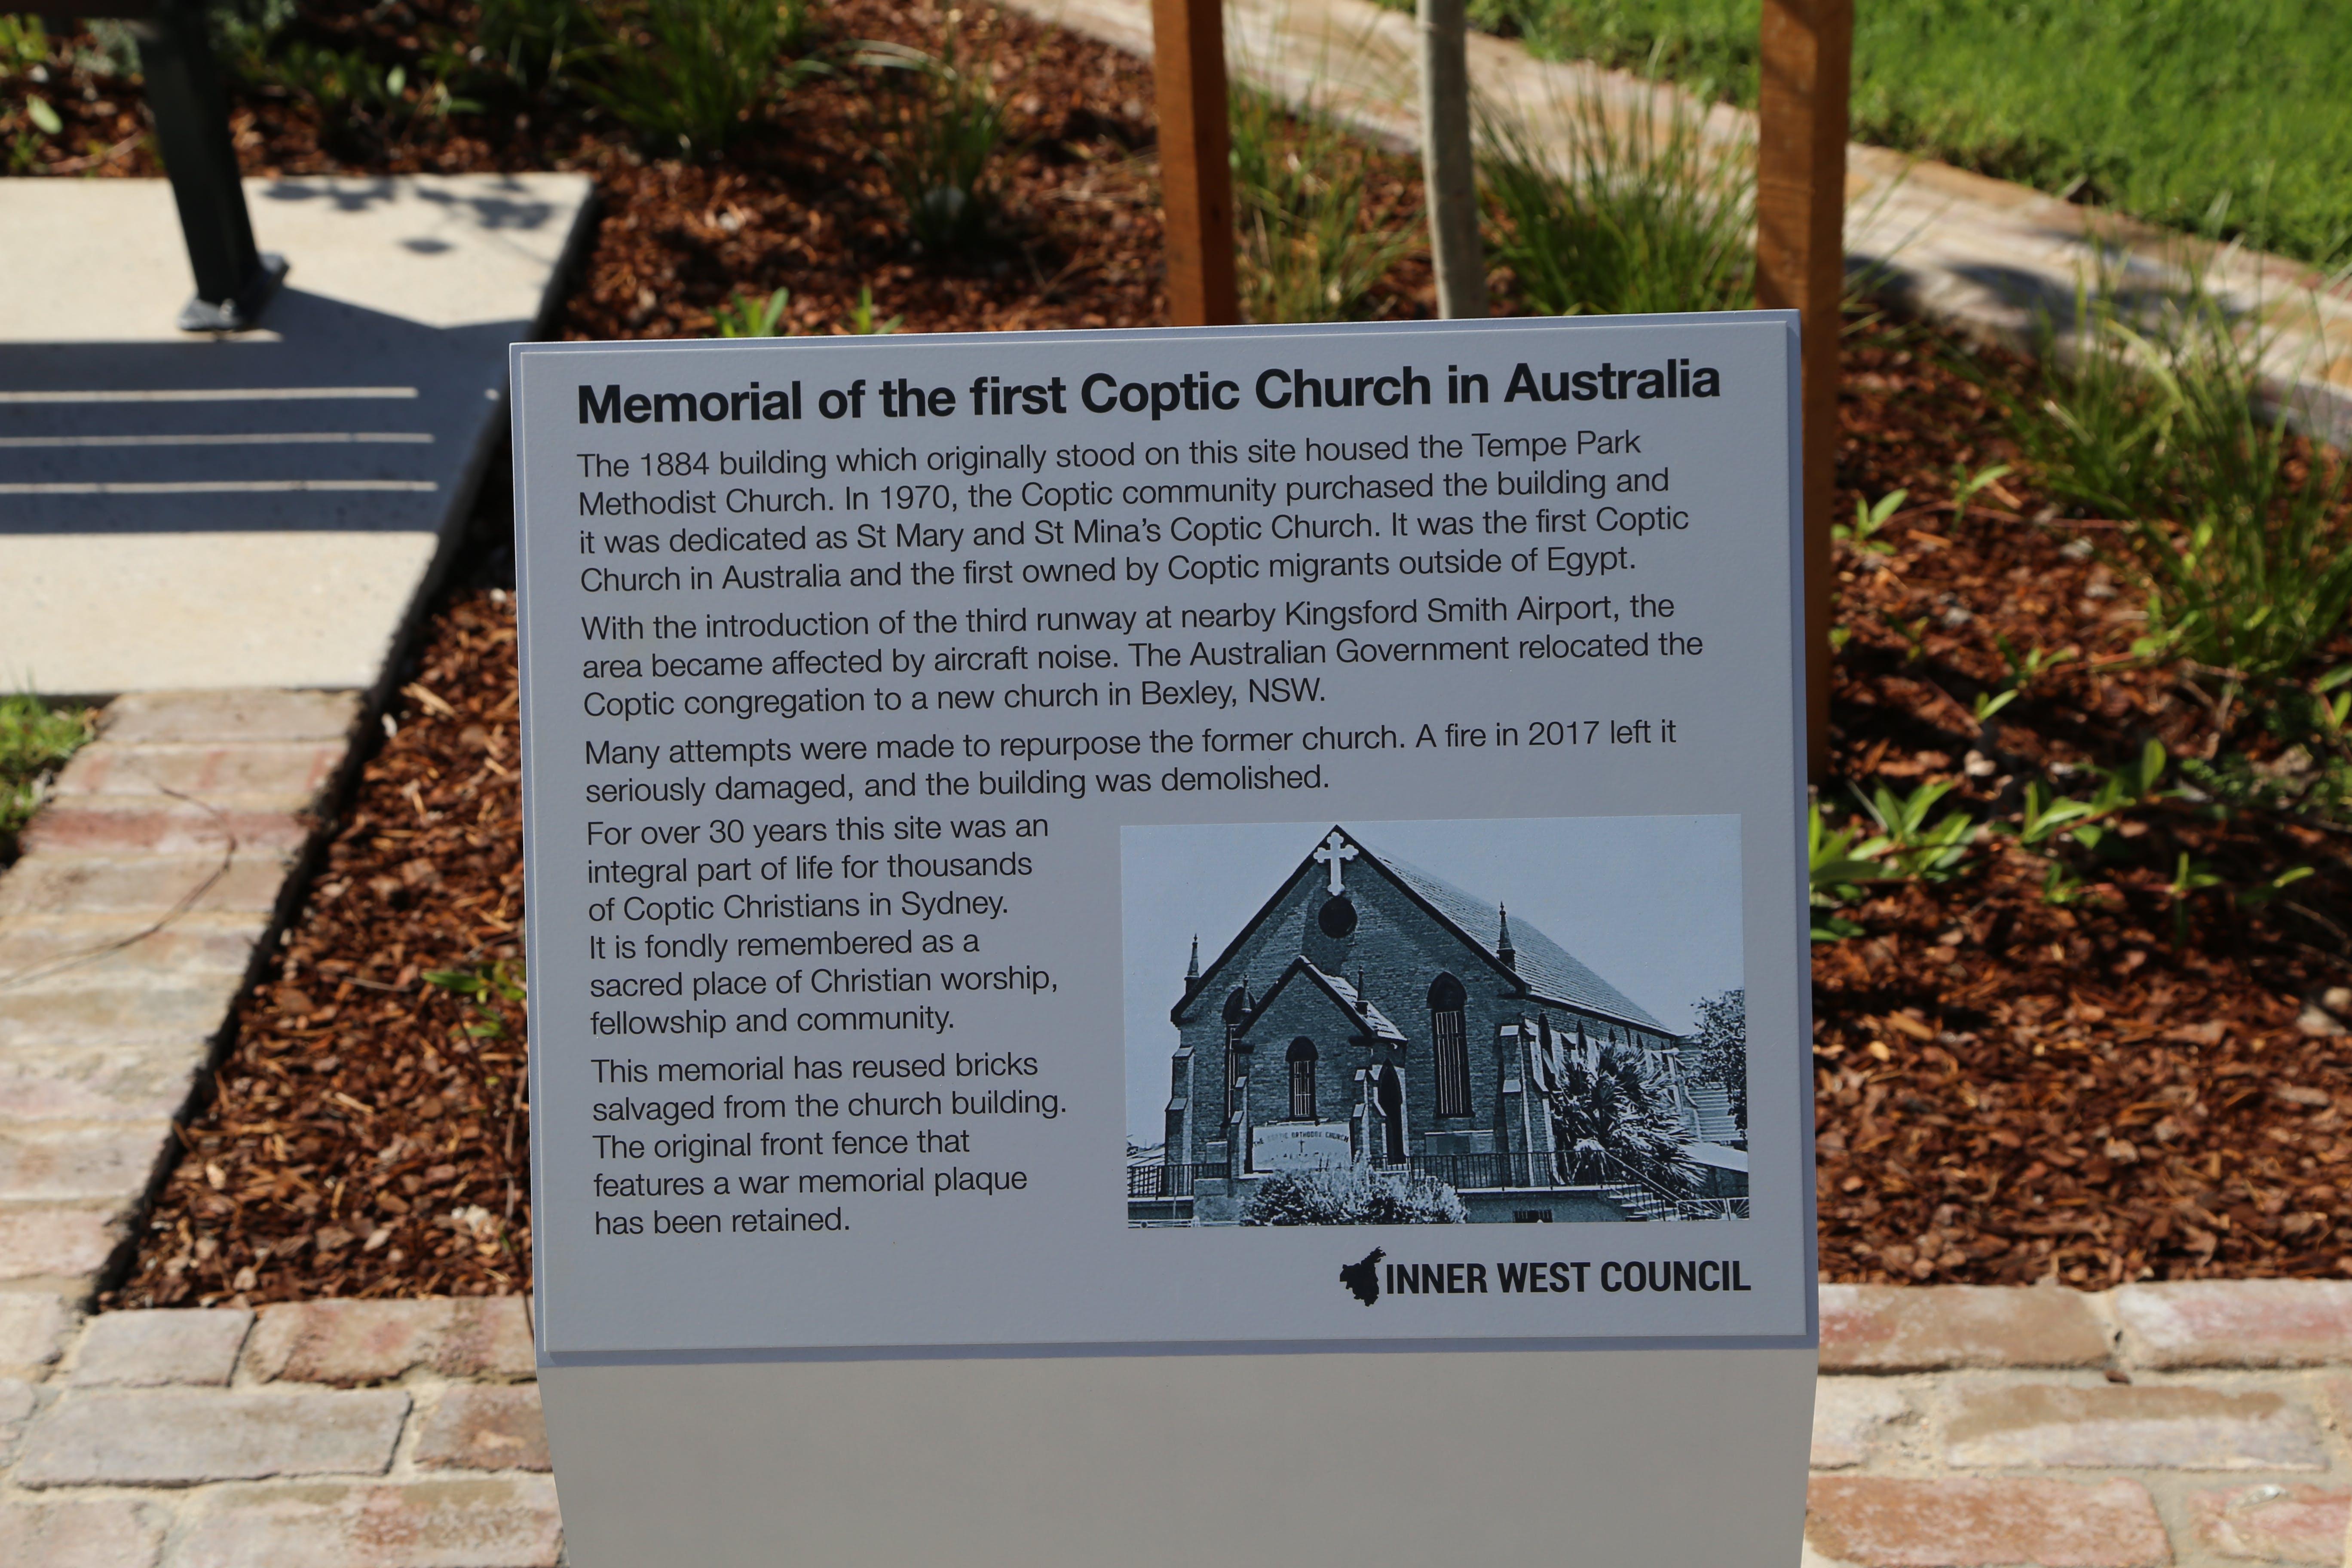 Outdoor memorial plaque to former Coptic Church at Sydenham Green